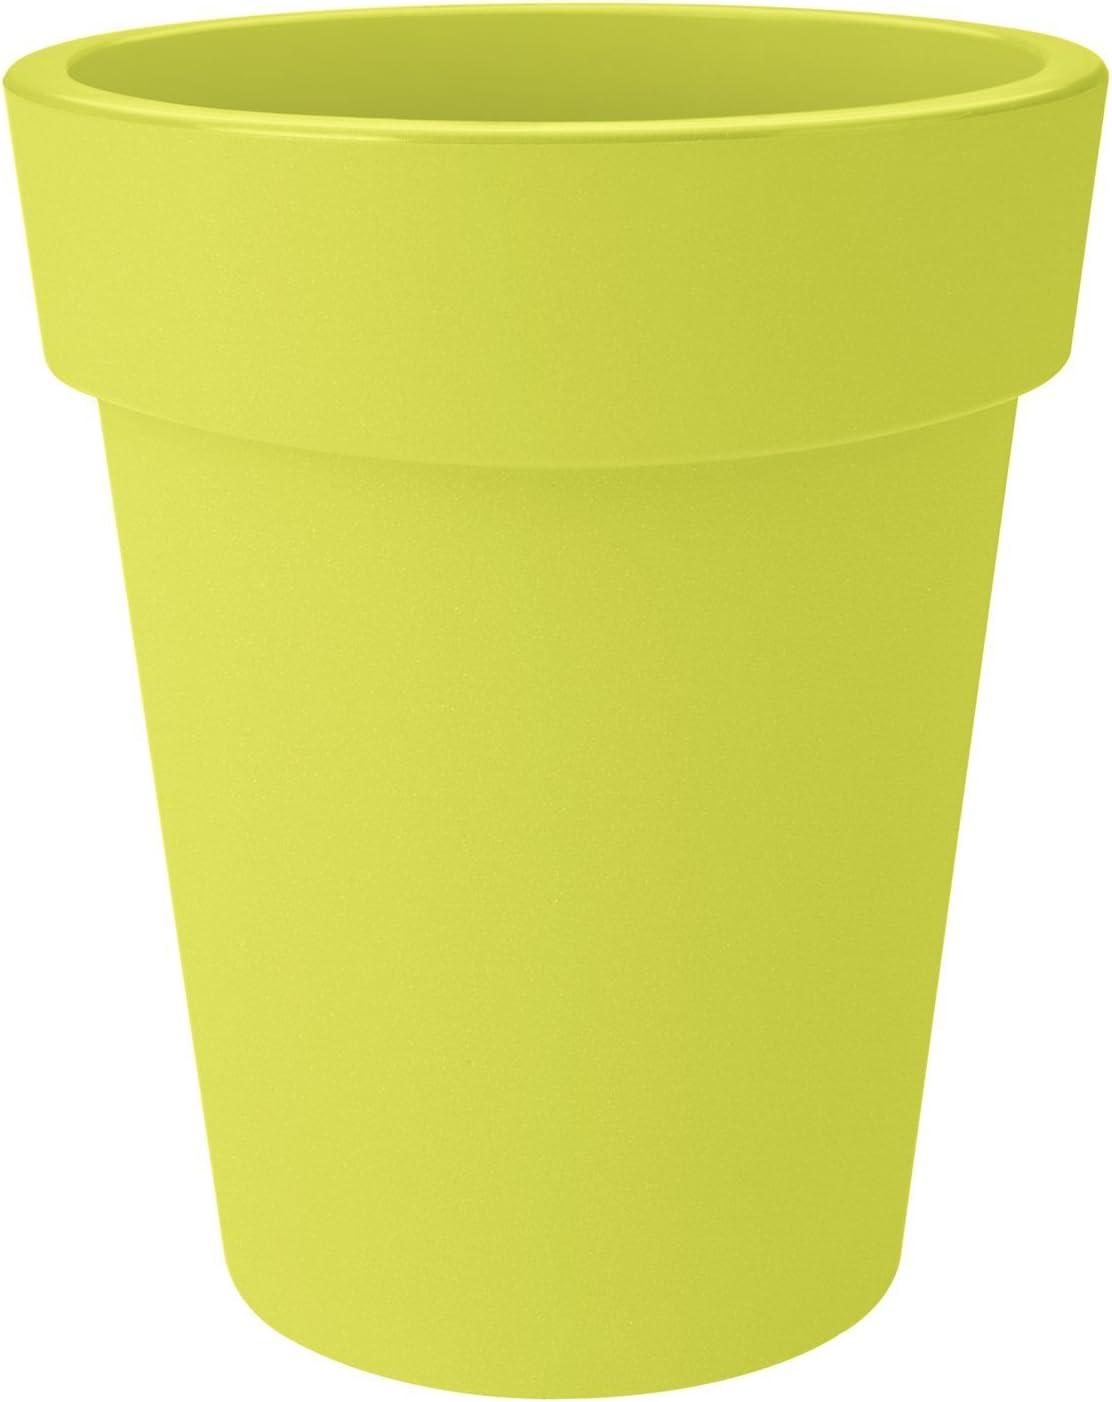 Ø 35 cm Elho Pflanztopf Green Basics